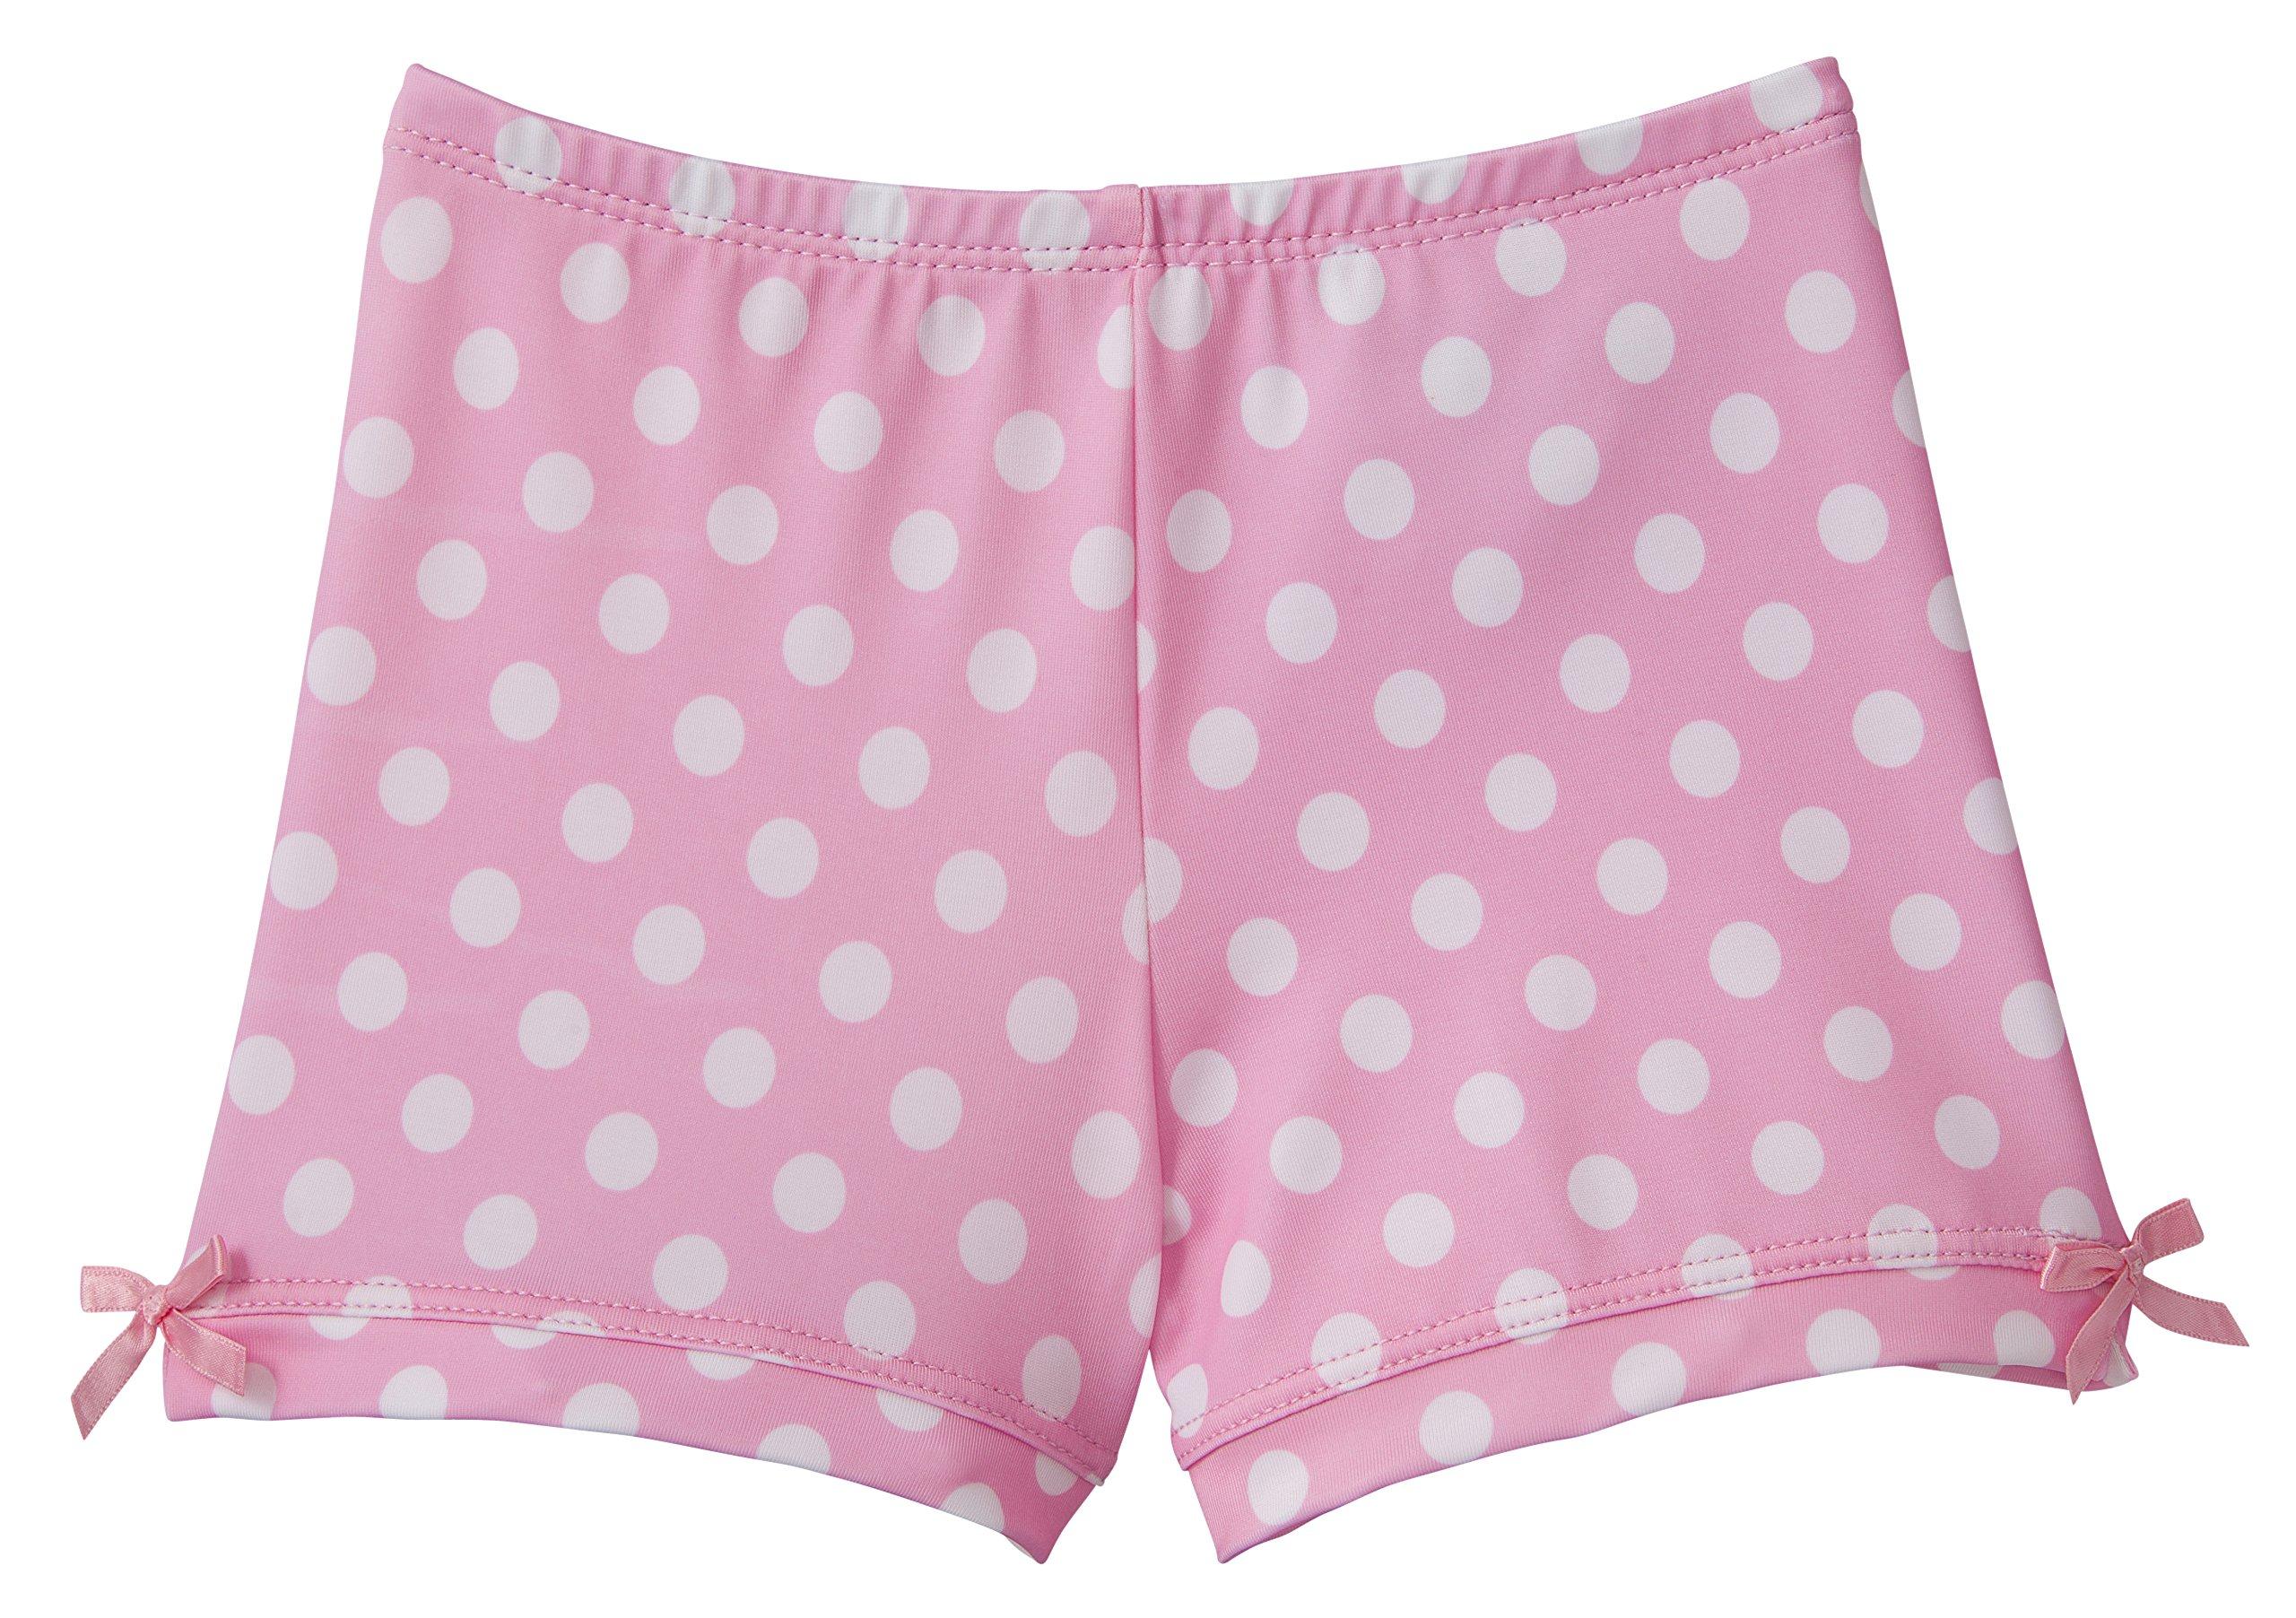 Monkeybar Buddies Worry-Free Girl's Playground Shorts, Nylon and Spandex Blend, Size 6X, Polka Dotty